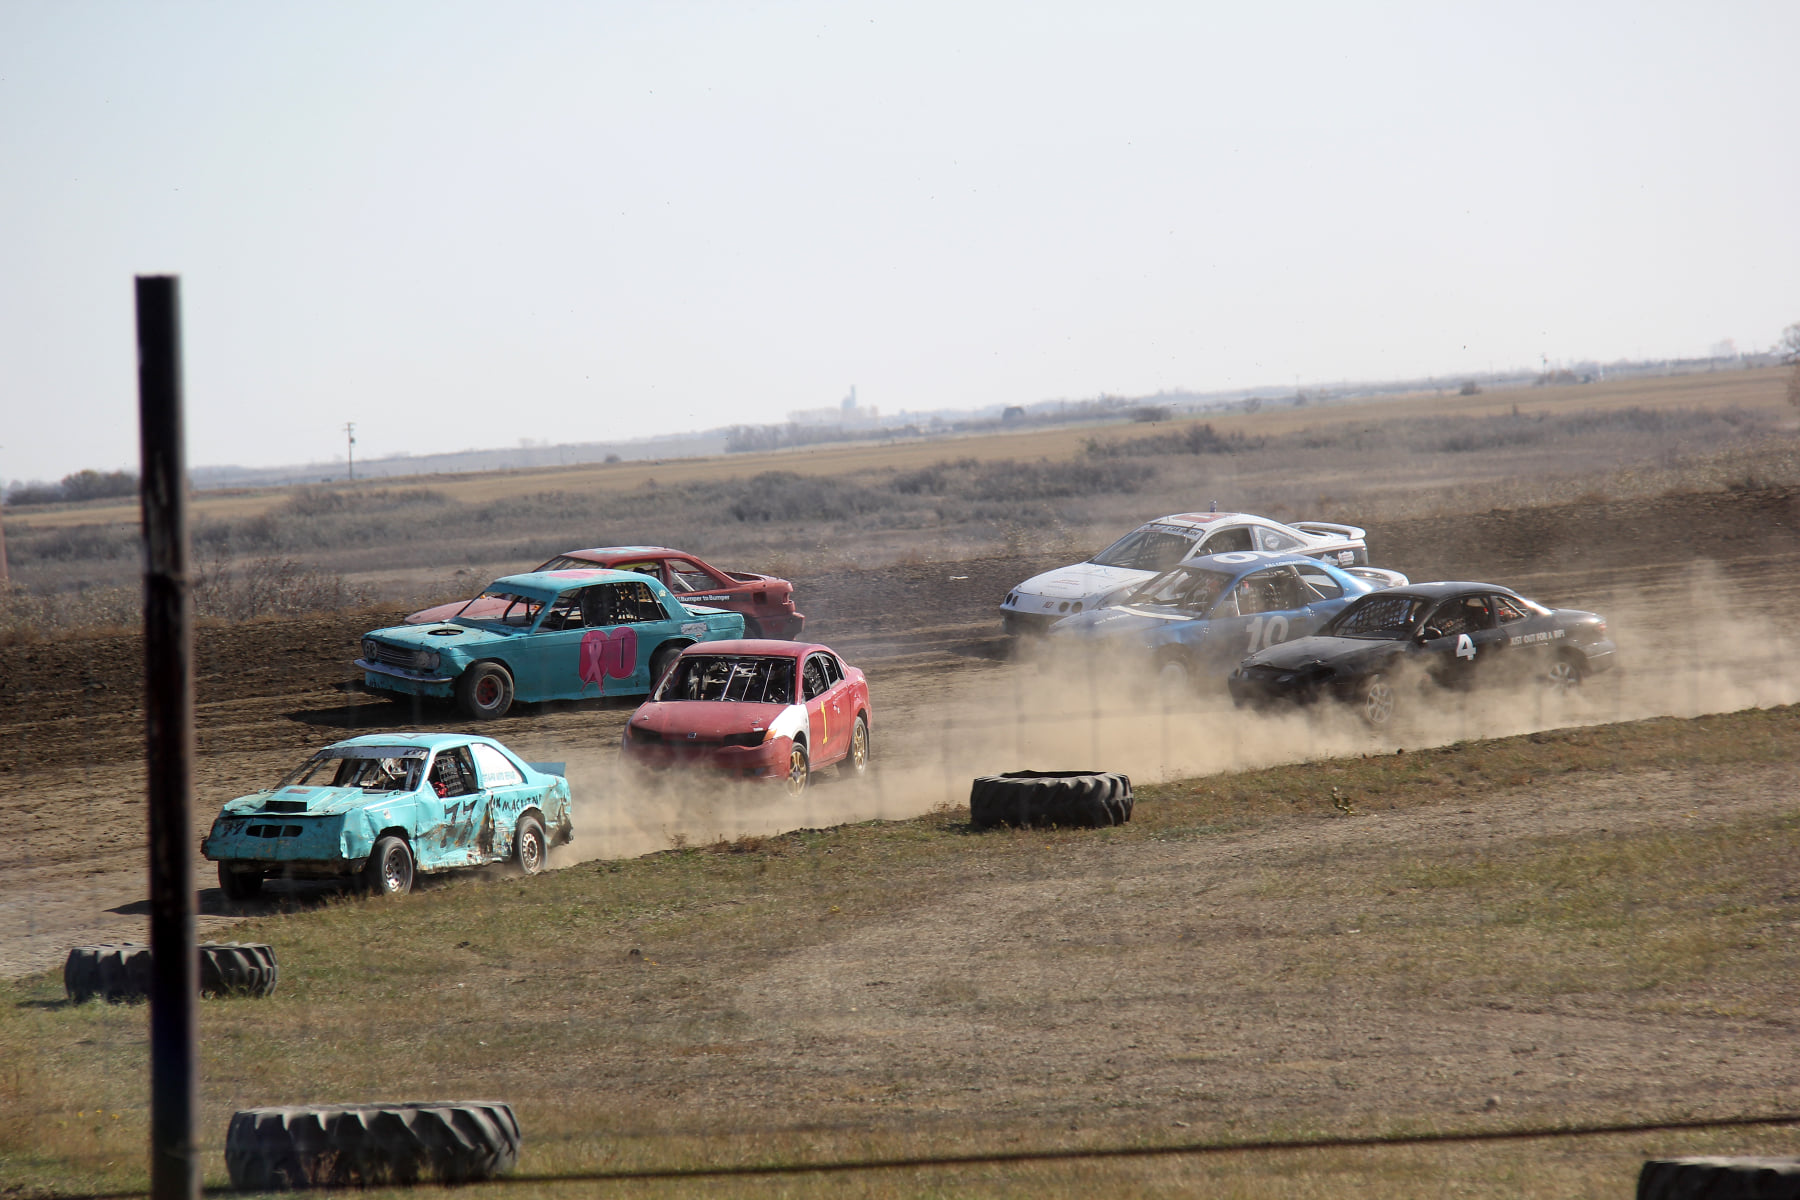 Outlook_Racing_Kemmer_Racing_Photography_13.jpg